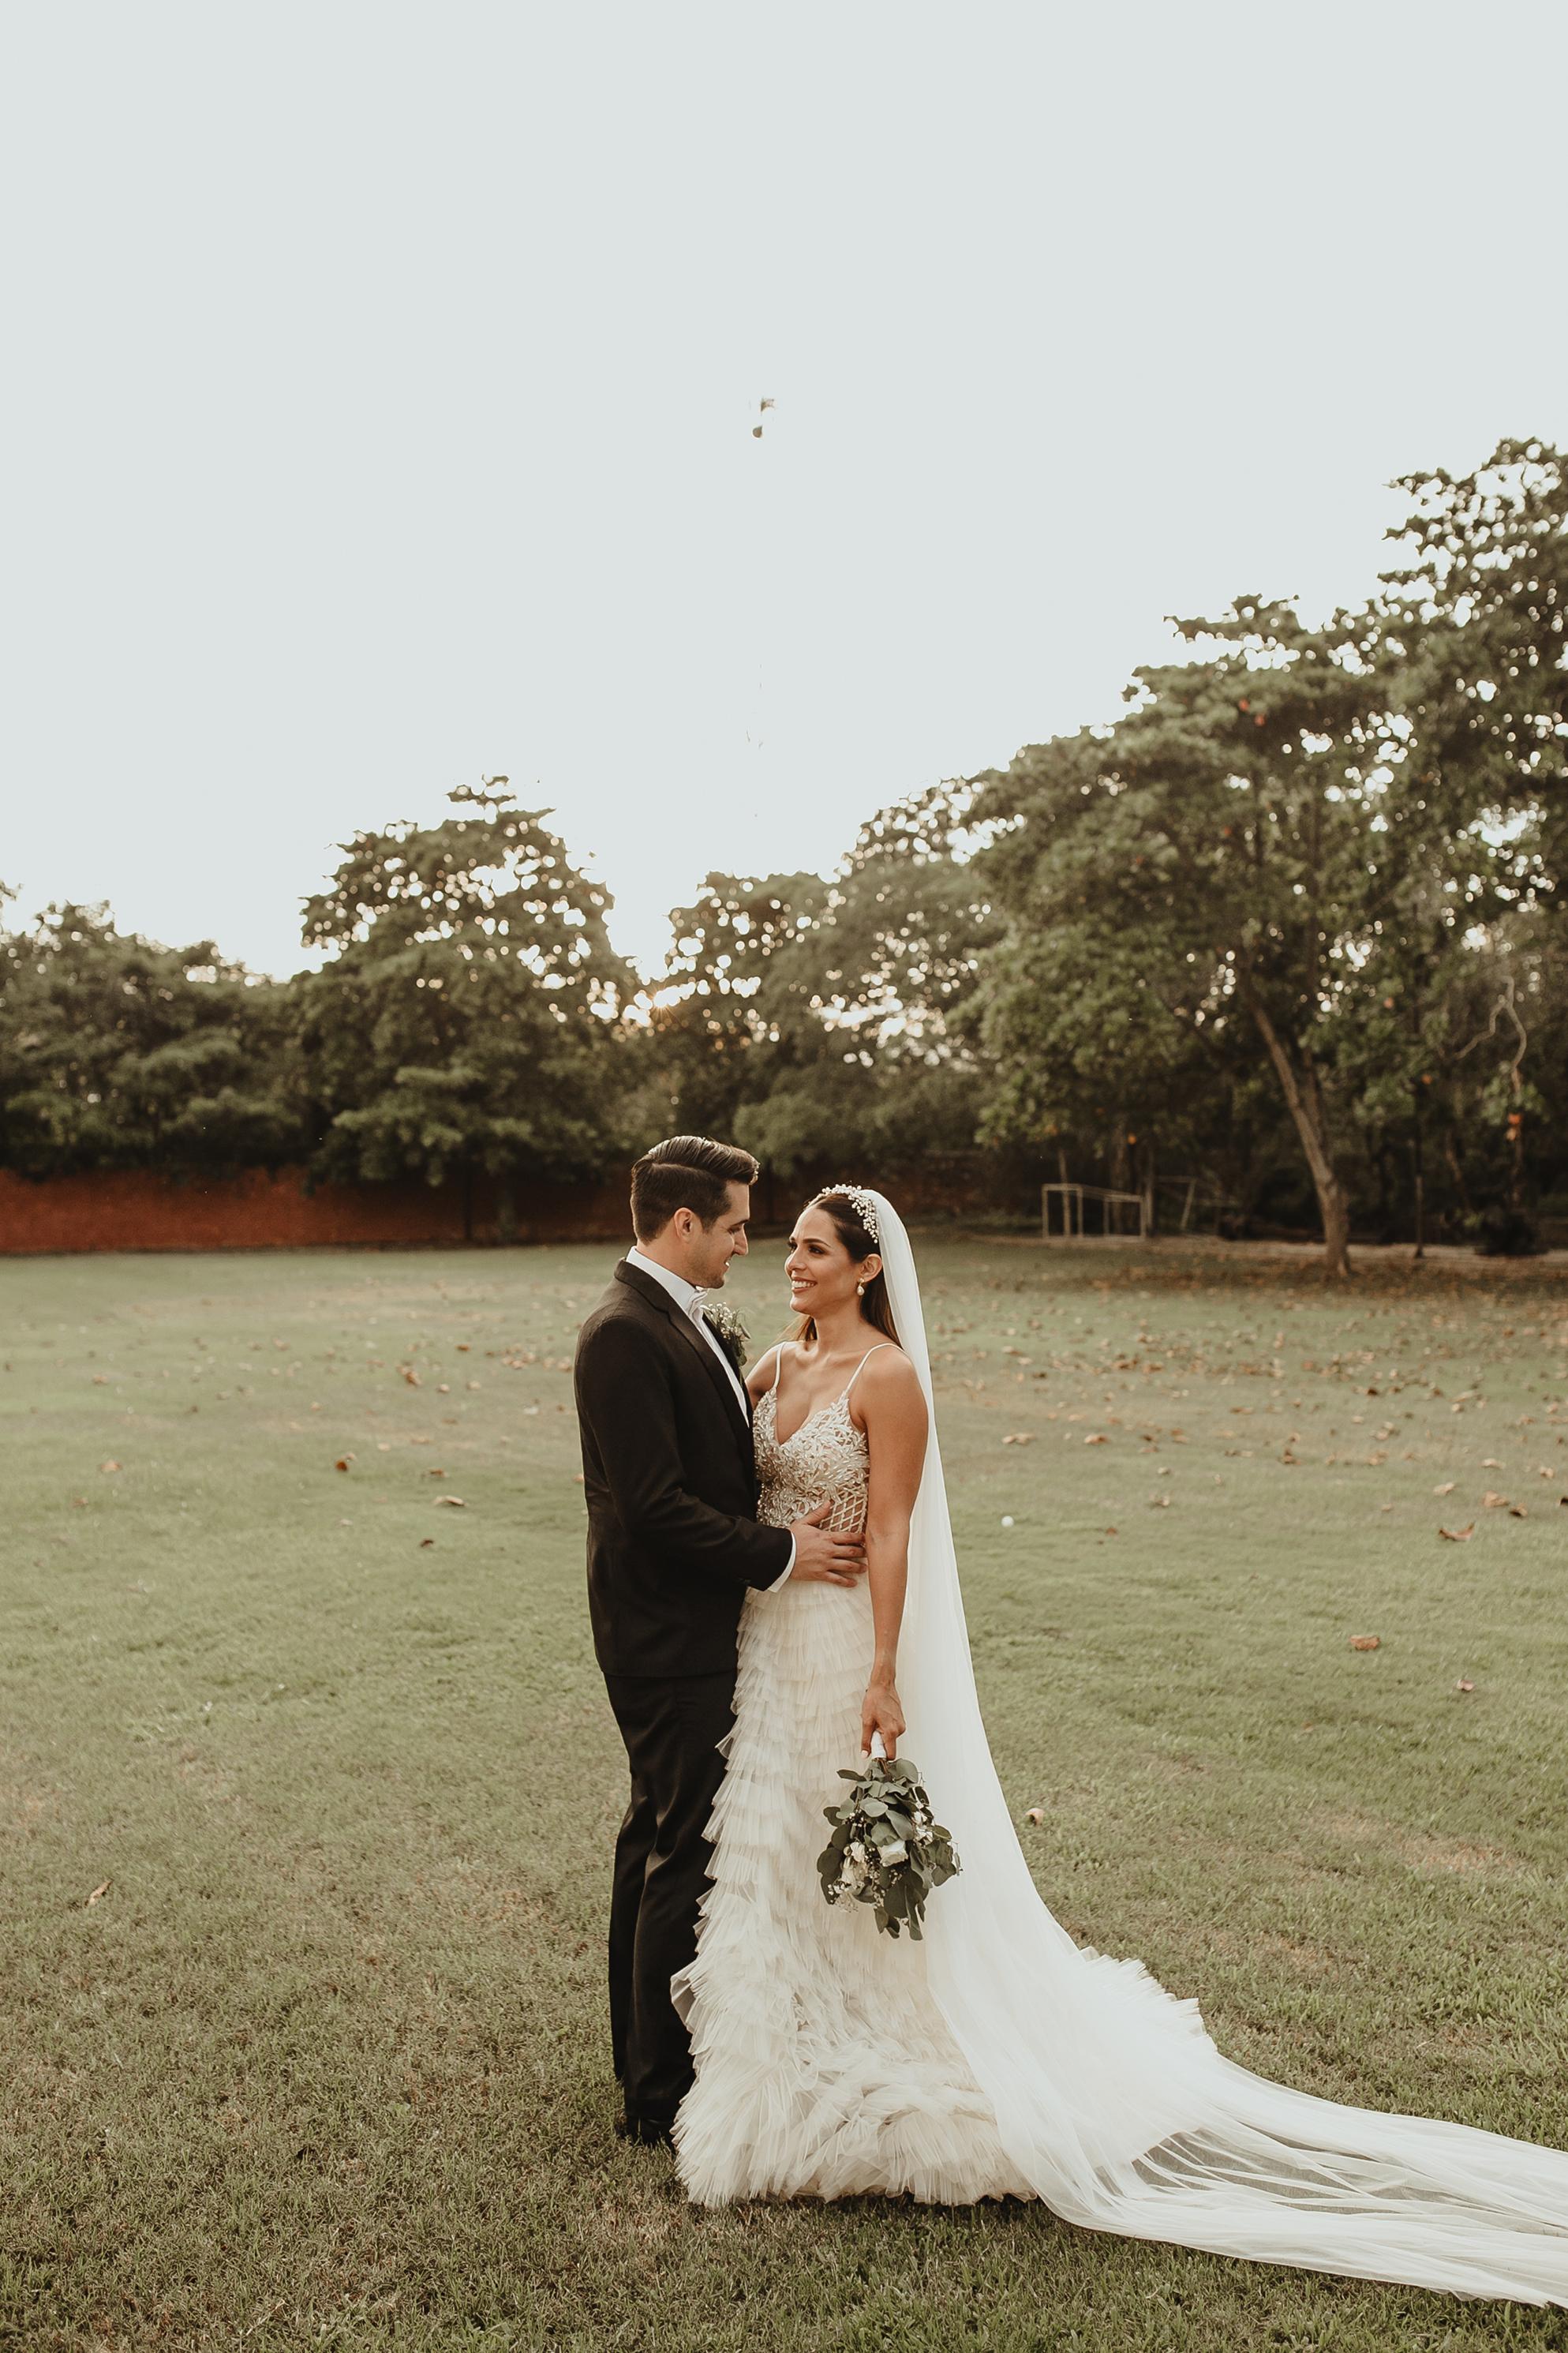 0828R&F__WeddingDestination_Weddingmerida_BodaMexico_FotografoDeBodas_FabrizioSimoneenFotografo.jpg